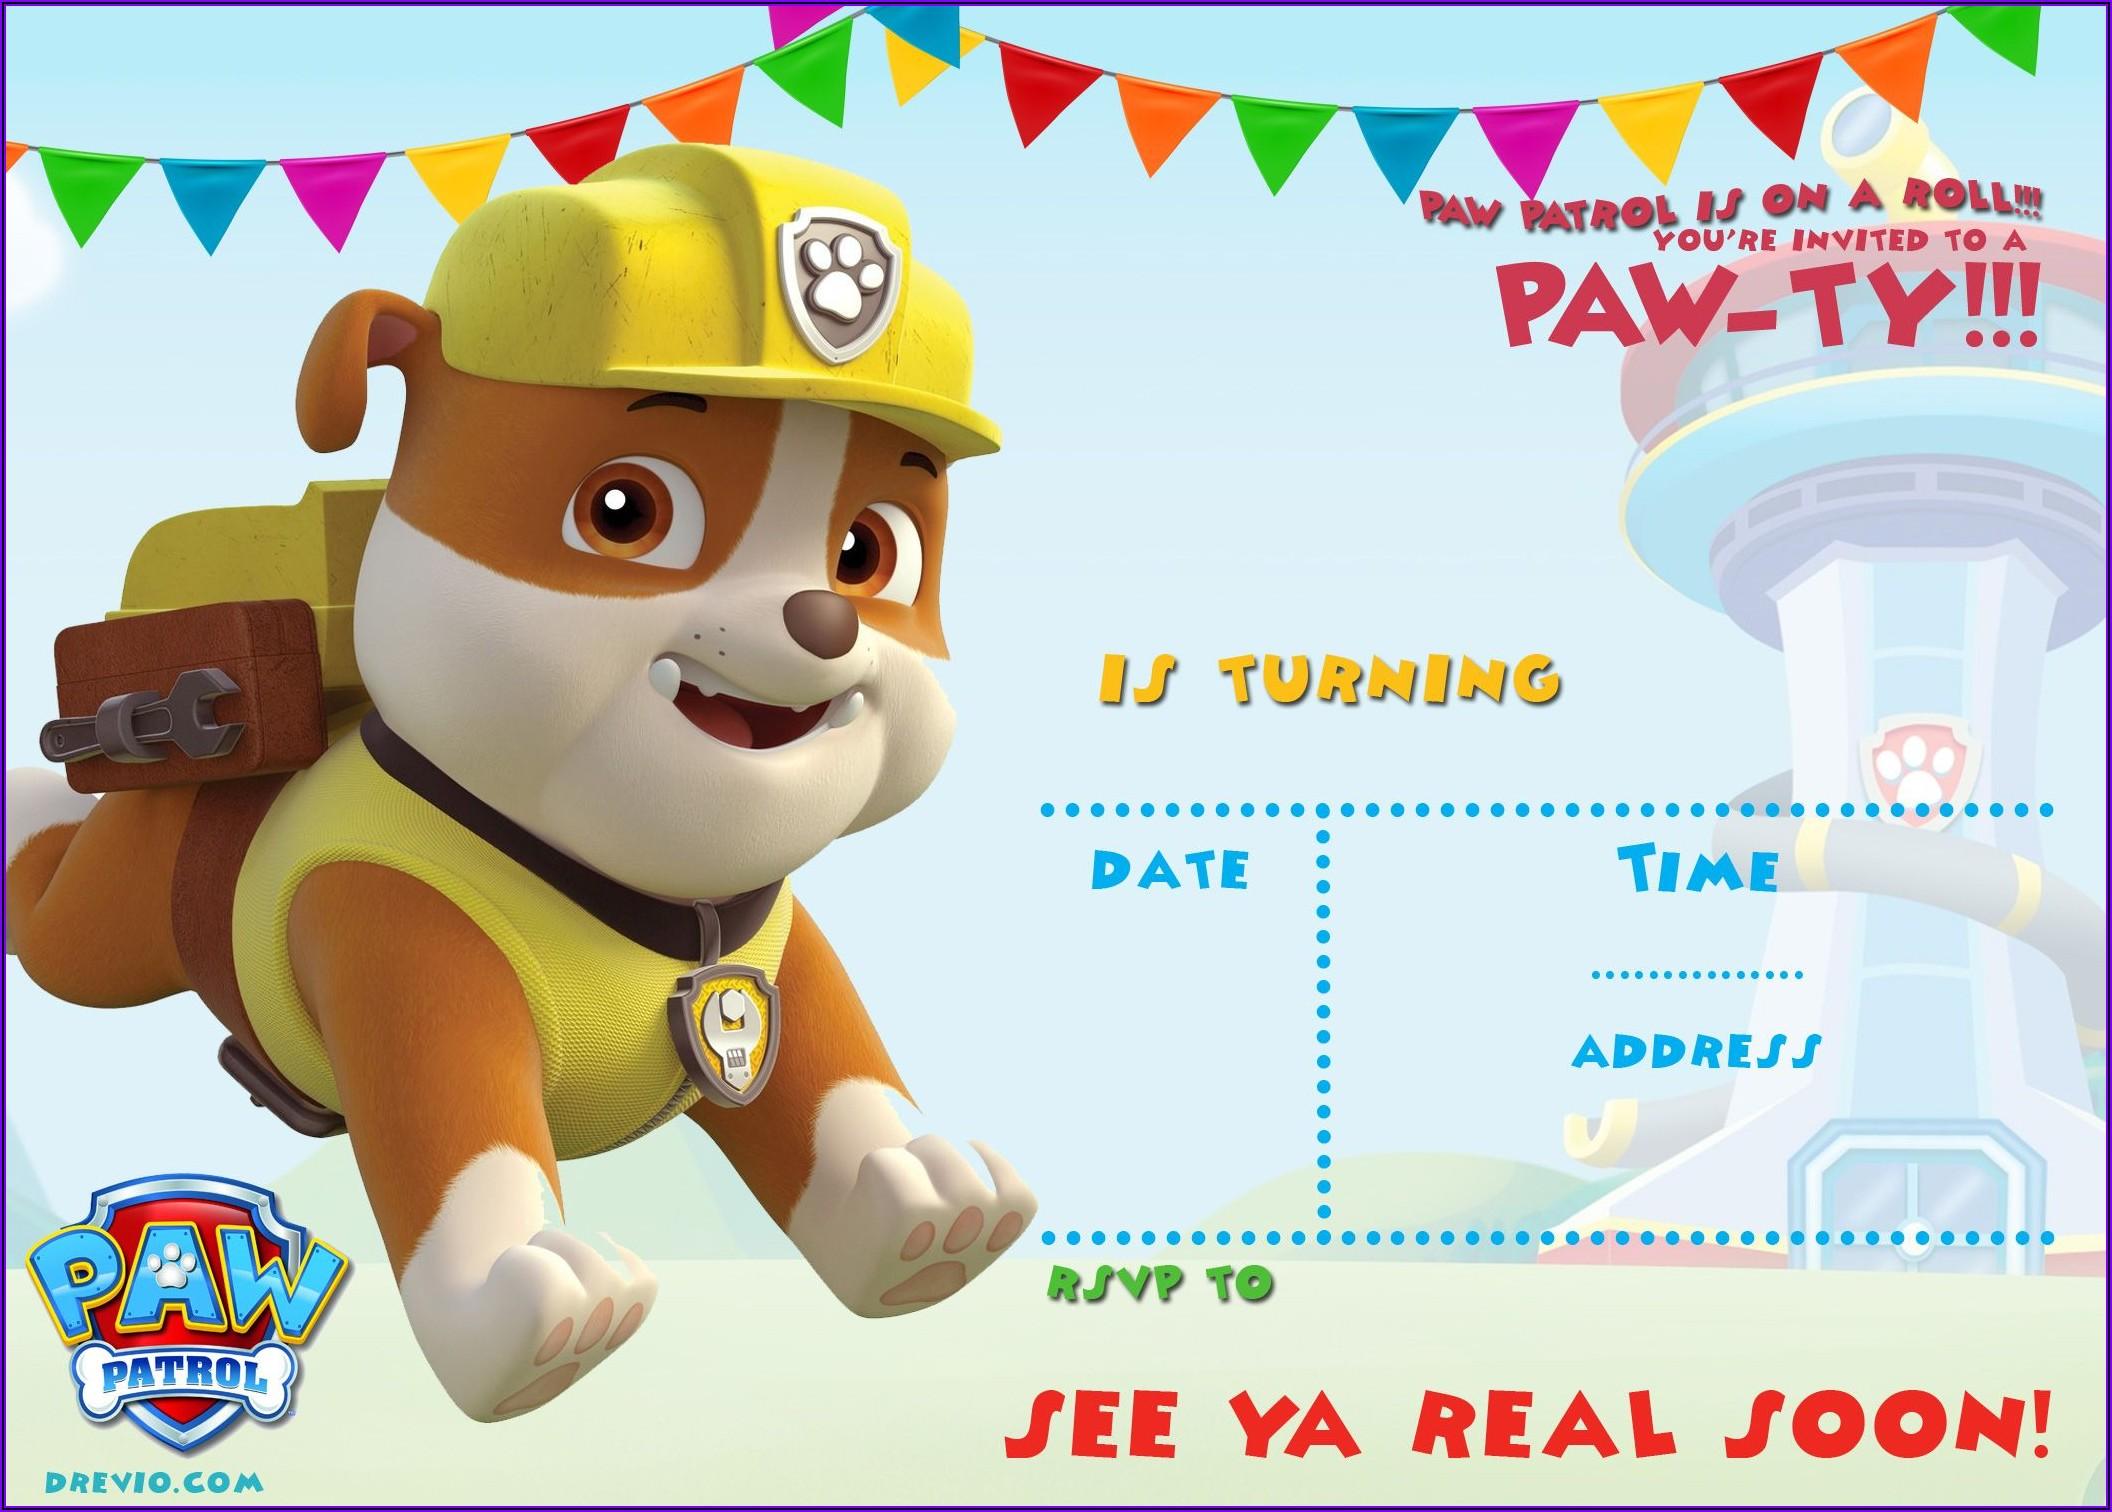 Customizable Paw Patrol Invitations